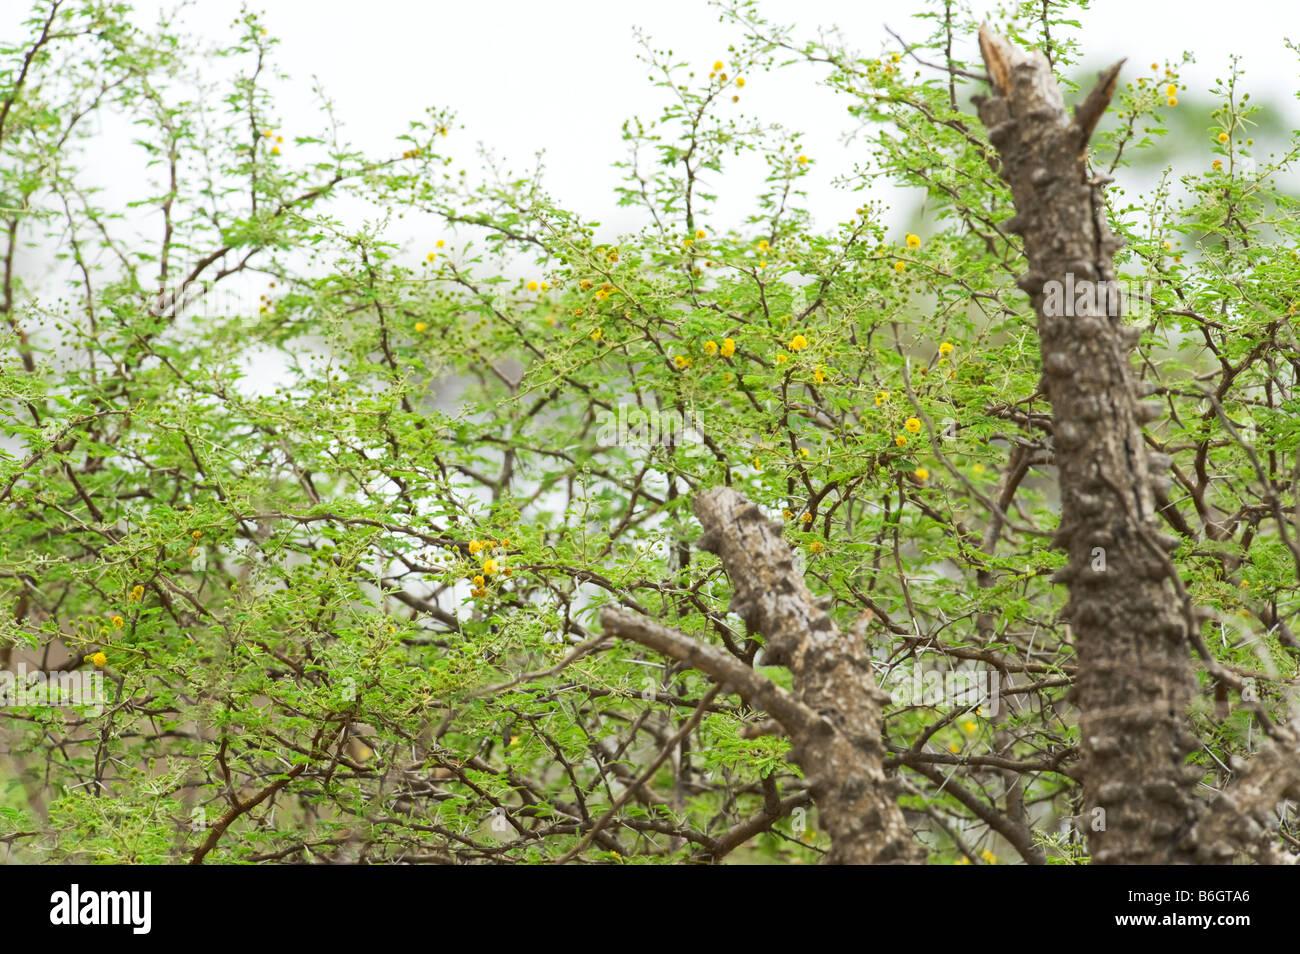 Africa acacia tree bark stock photos africa acacia tree bark stock south africa acacia tree acaciatree bush bushland with new green light leaves flowering spring spine mightylinksfo